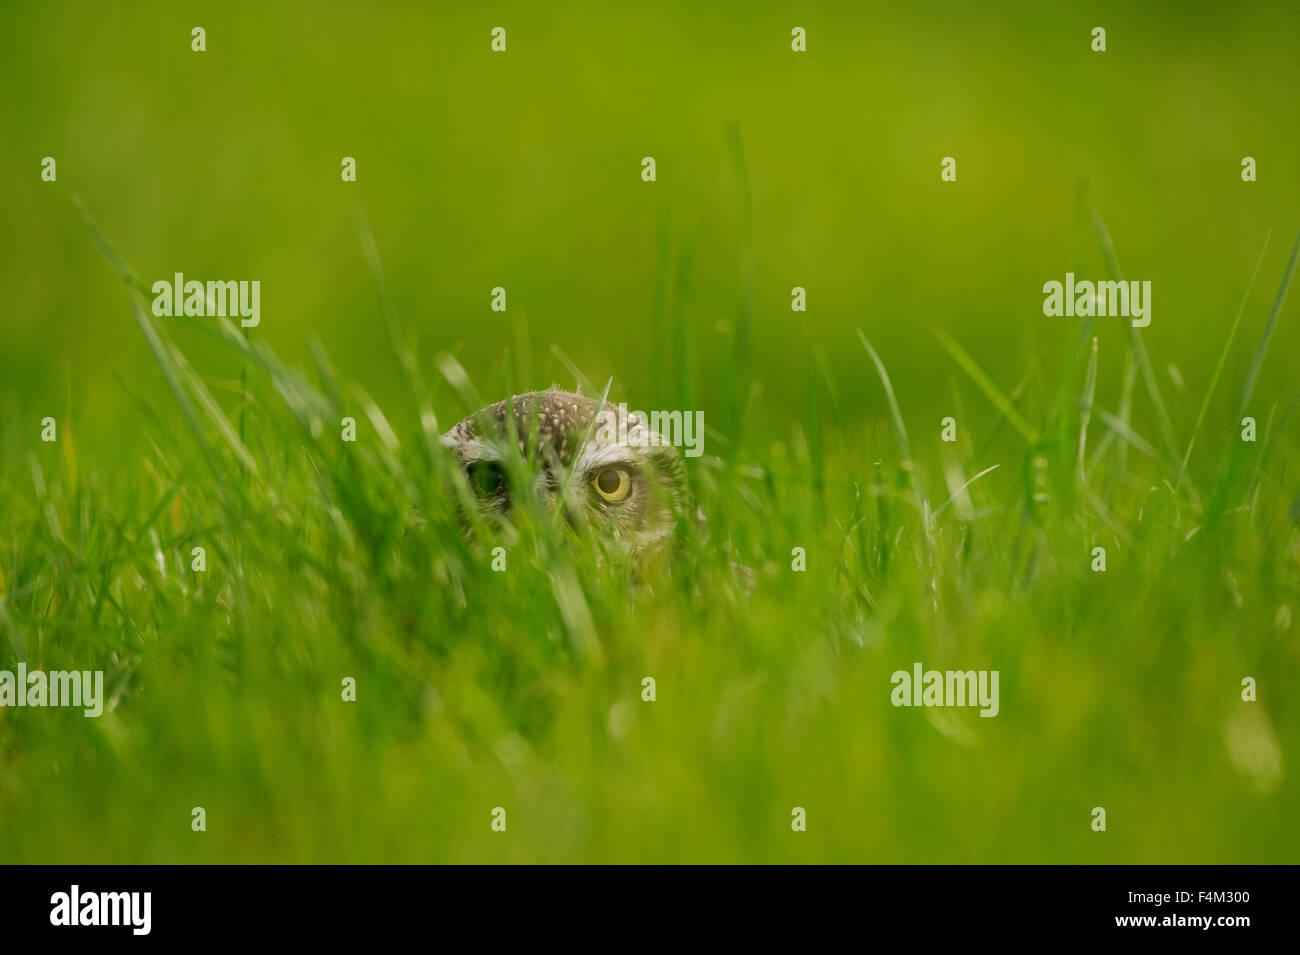 Steinkauz (Athene Noctua) spähen durch Rasen Stockbild